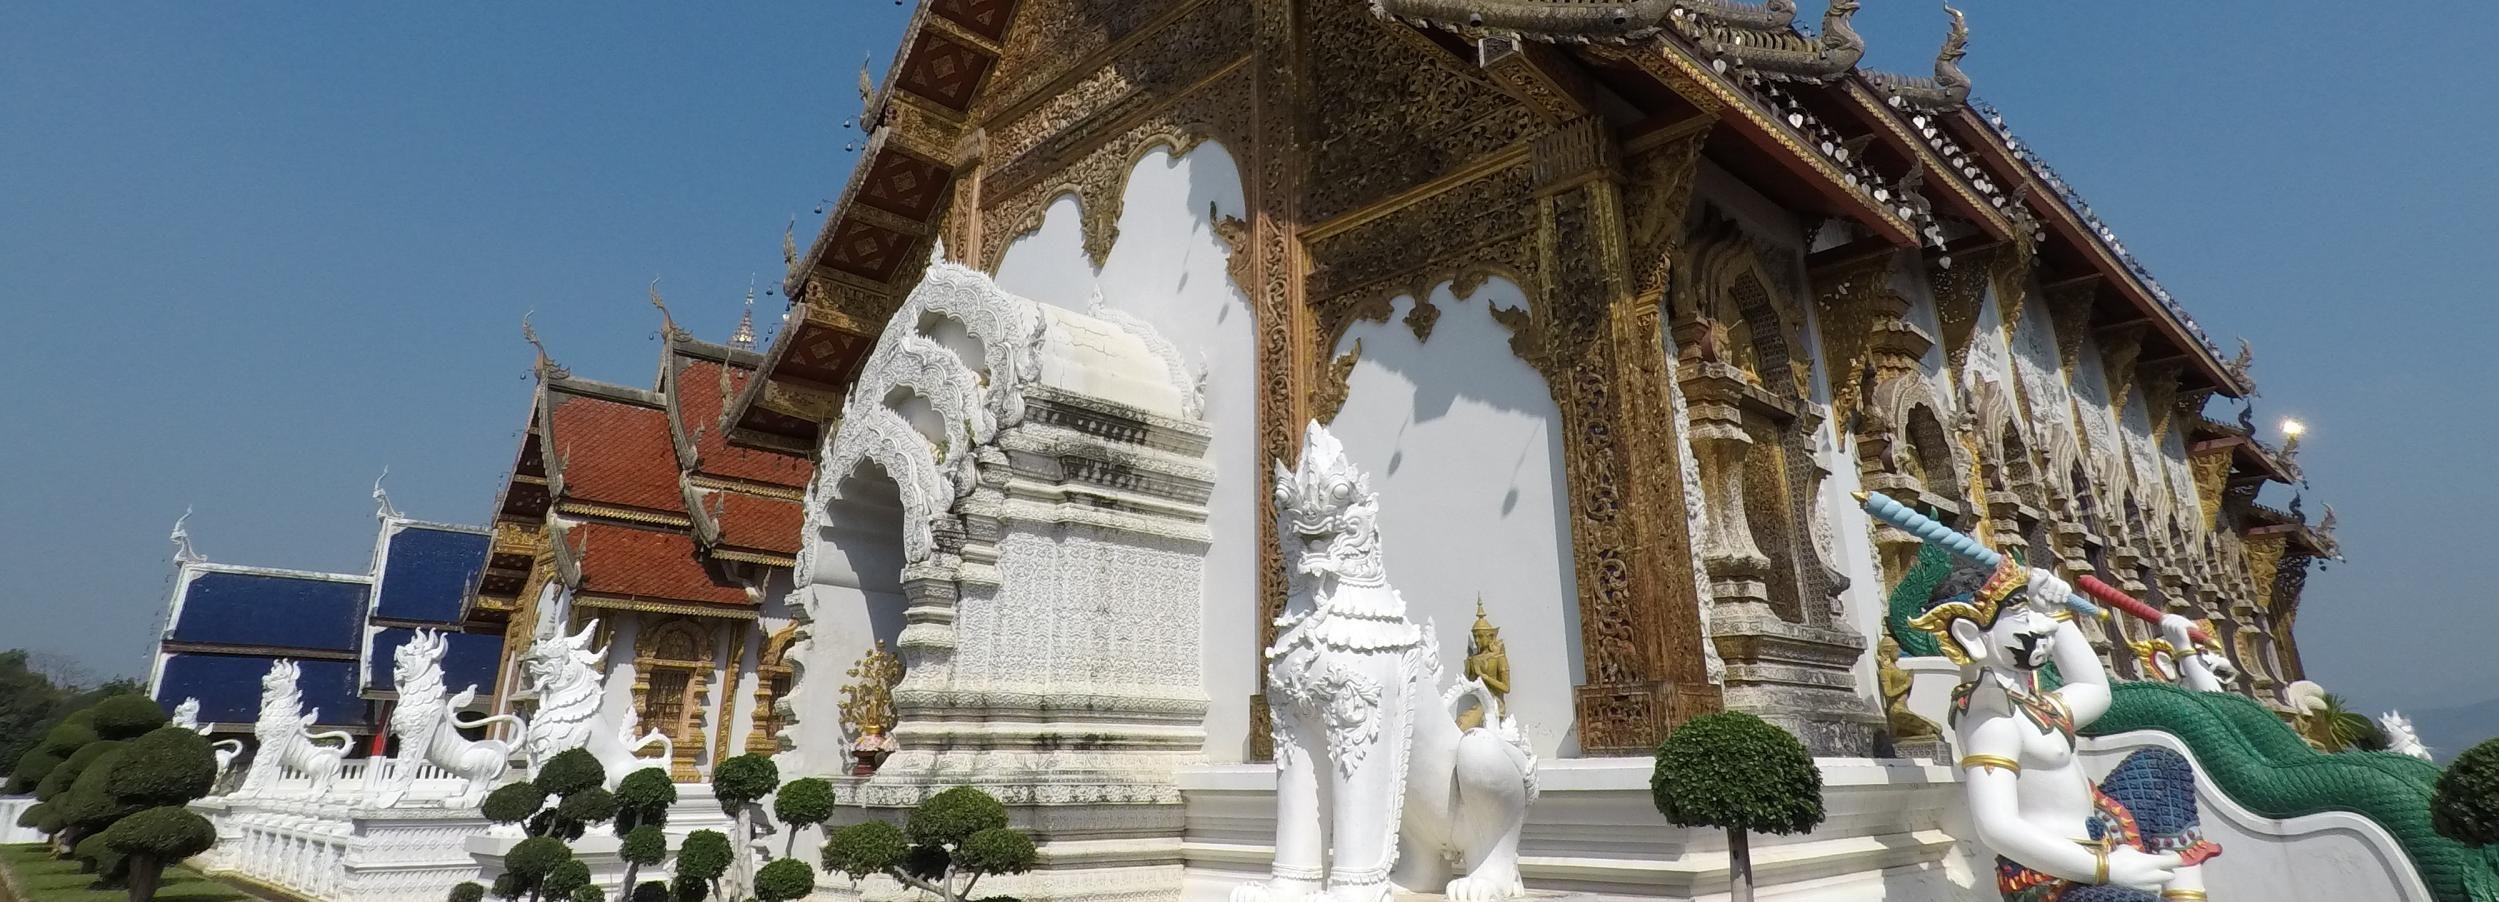 Chiang Mai: cueva Chiang Dao, templo Den Sali y catarata